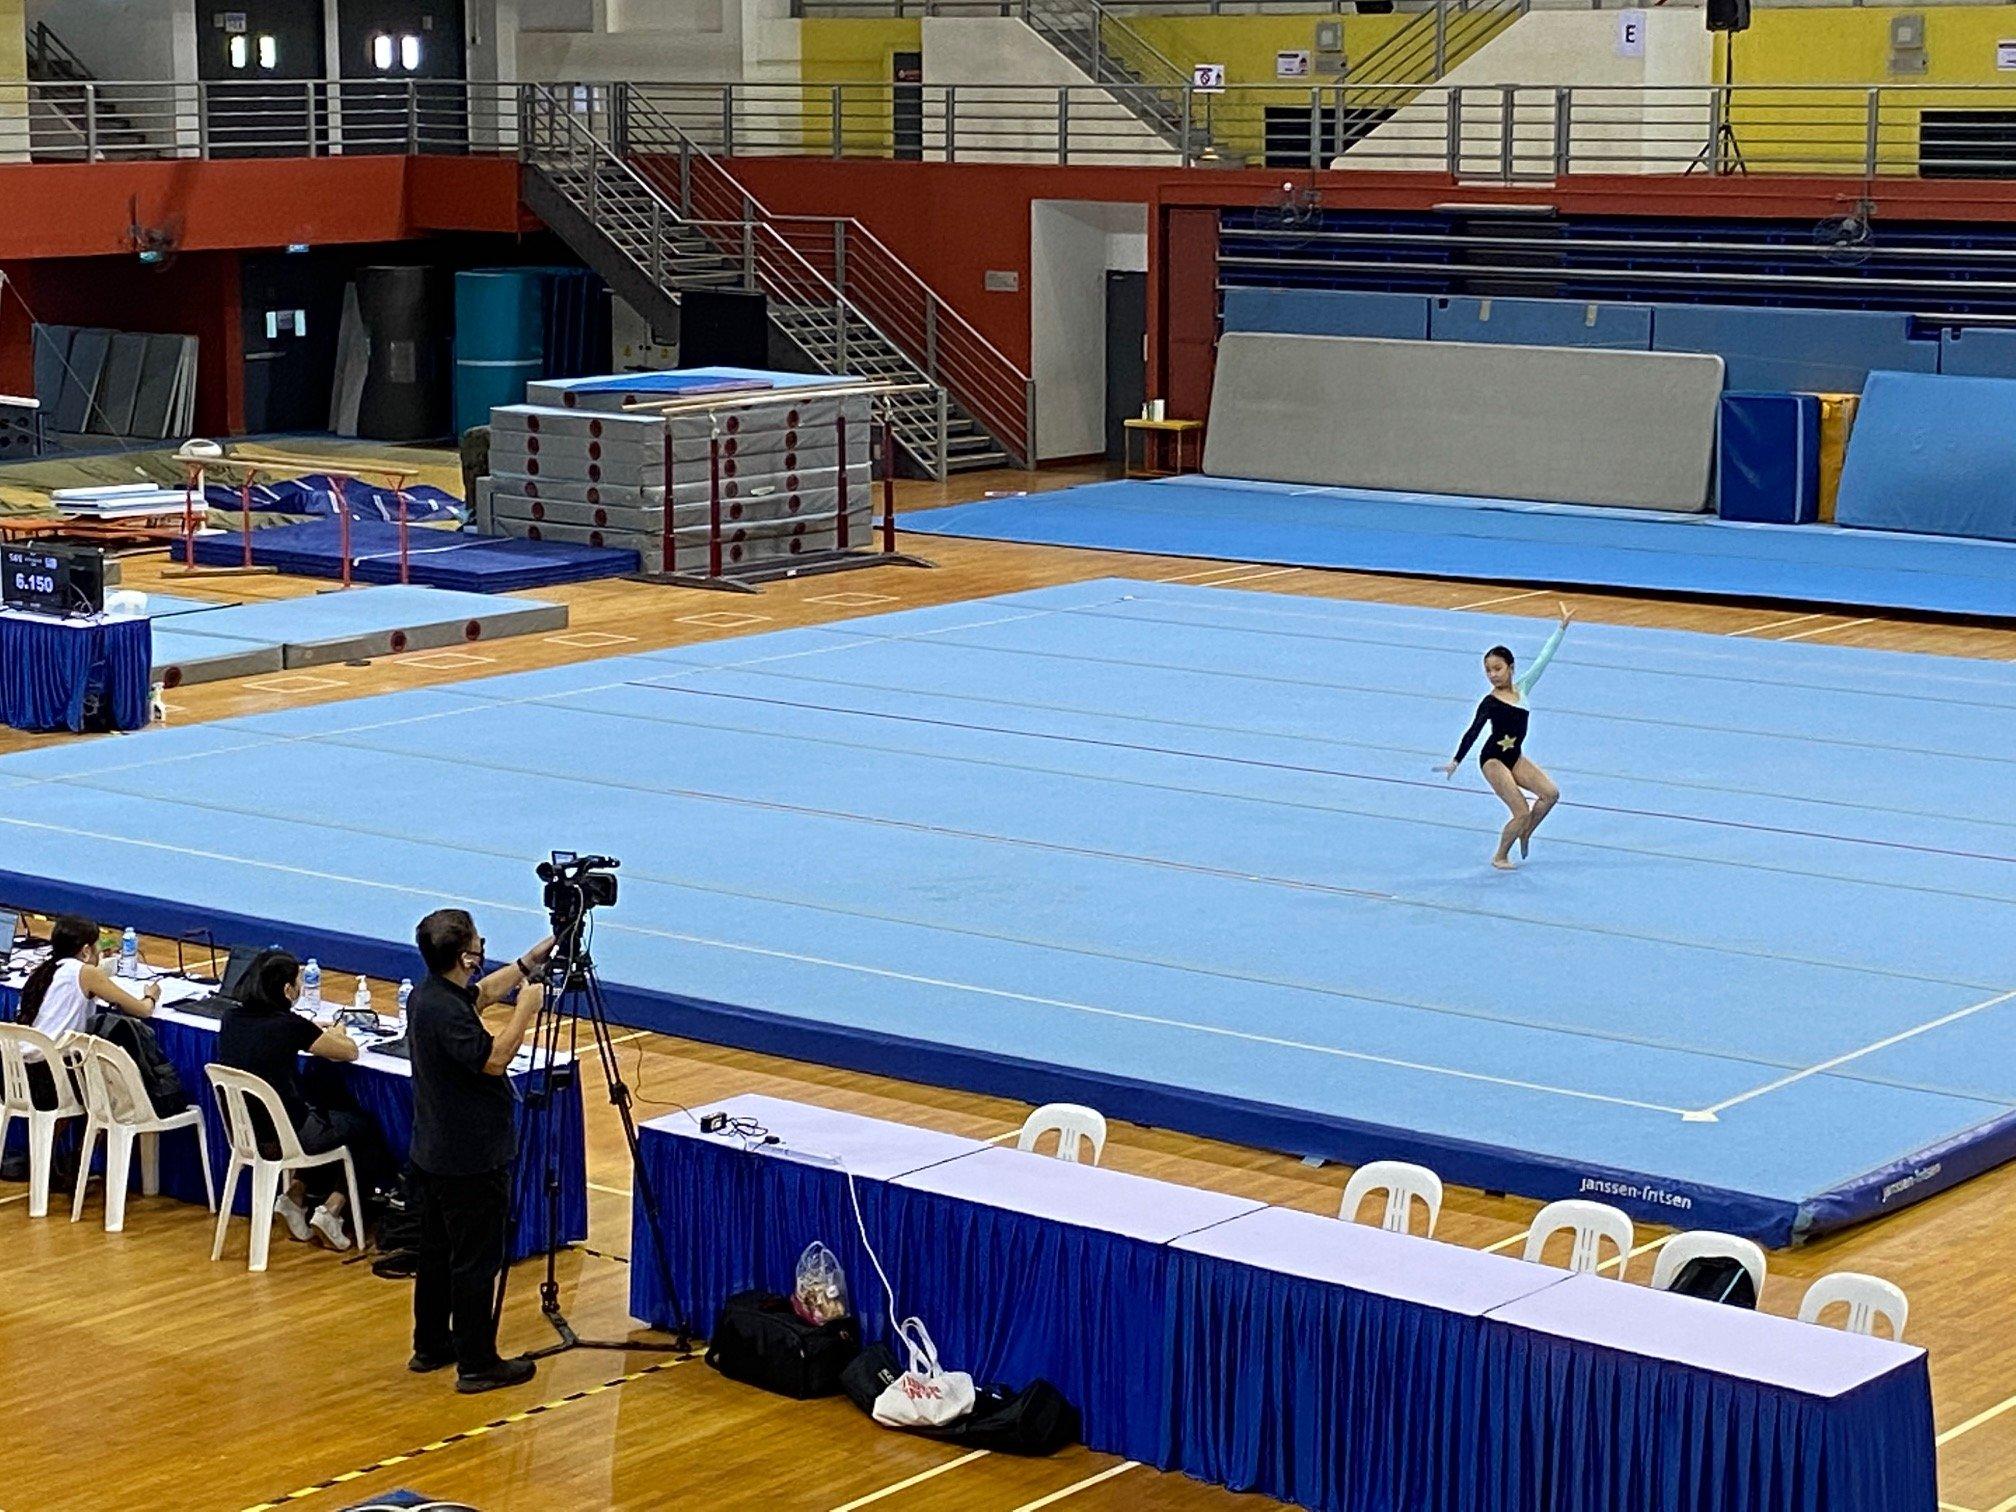 NSG Snr Div gymnastics - floor exercise (Springdale) 2-1